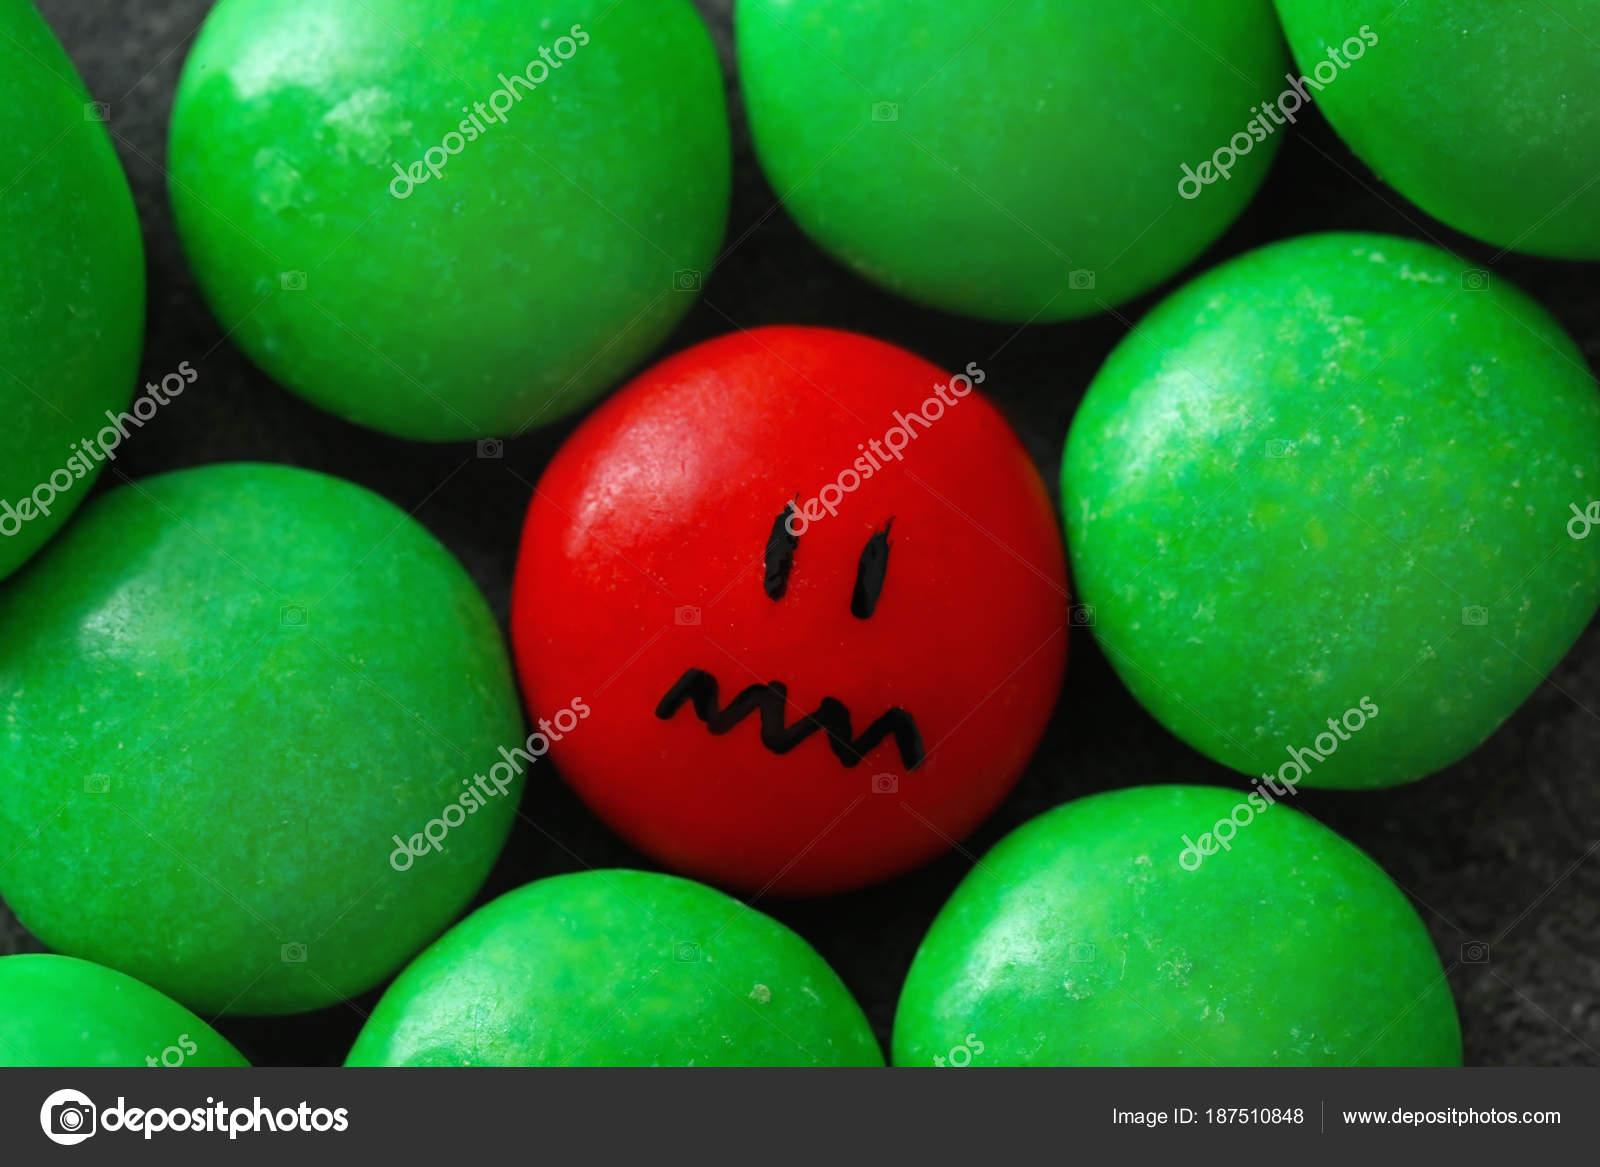 Una Gota Roja Con Cara Triste Pintado Entre Verdes Concepto De